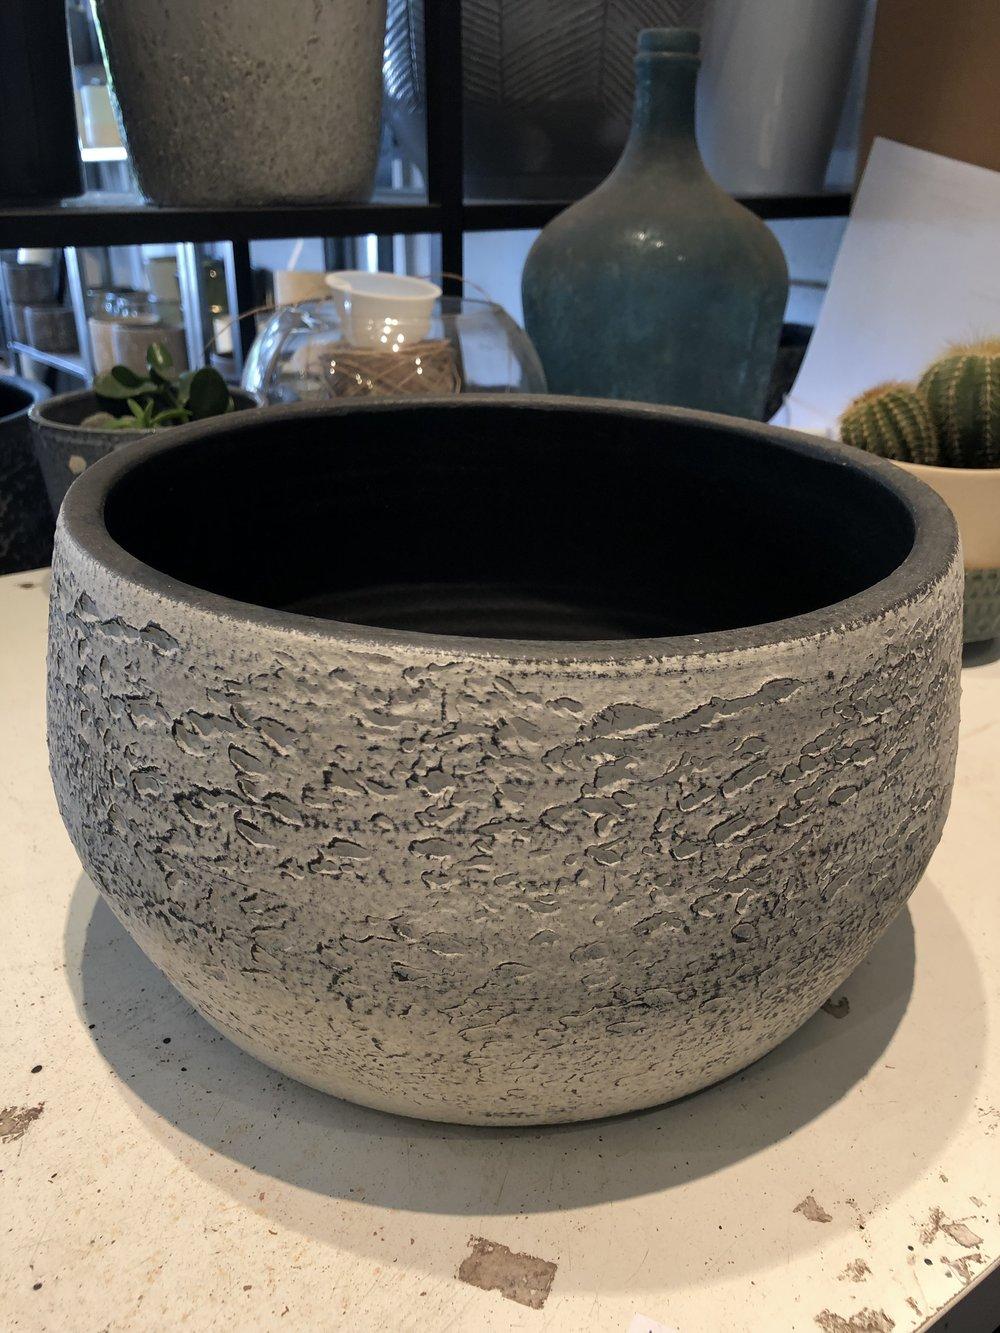 Cactus Bowl, Shallow bowl, glass bowl terrarium